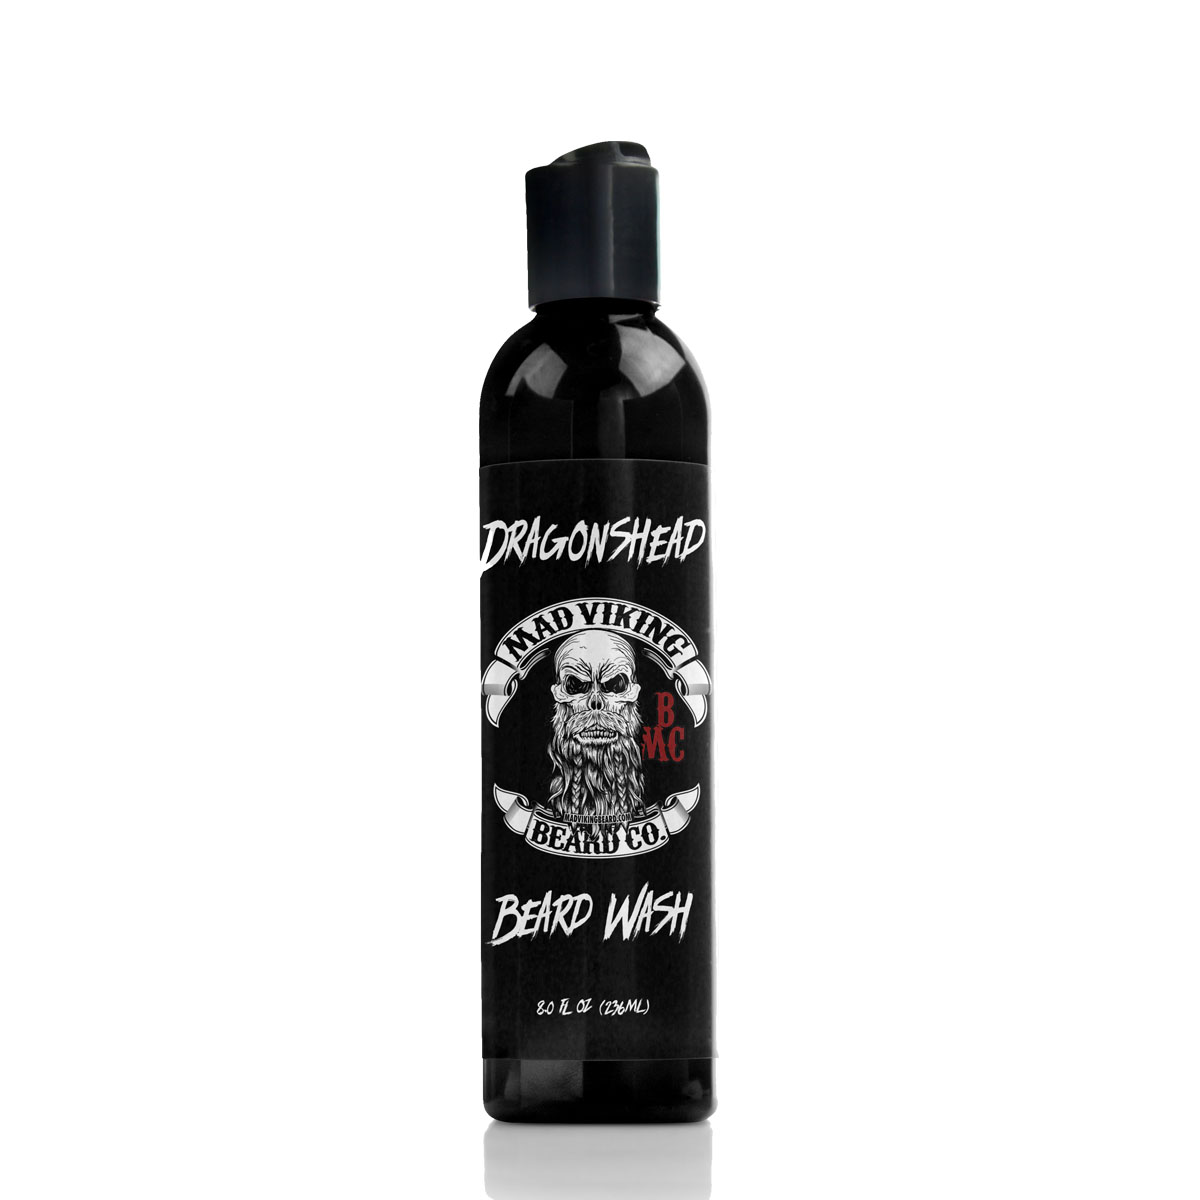 33edfe38 Dragonshead Mad Viking's Beard Wash